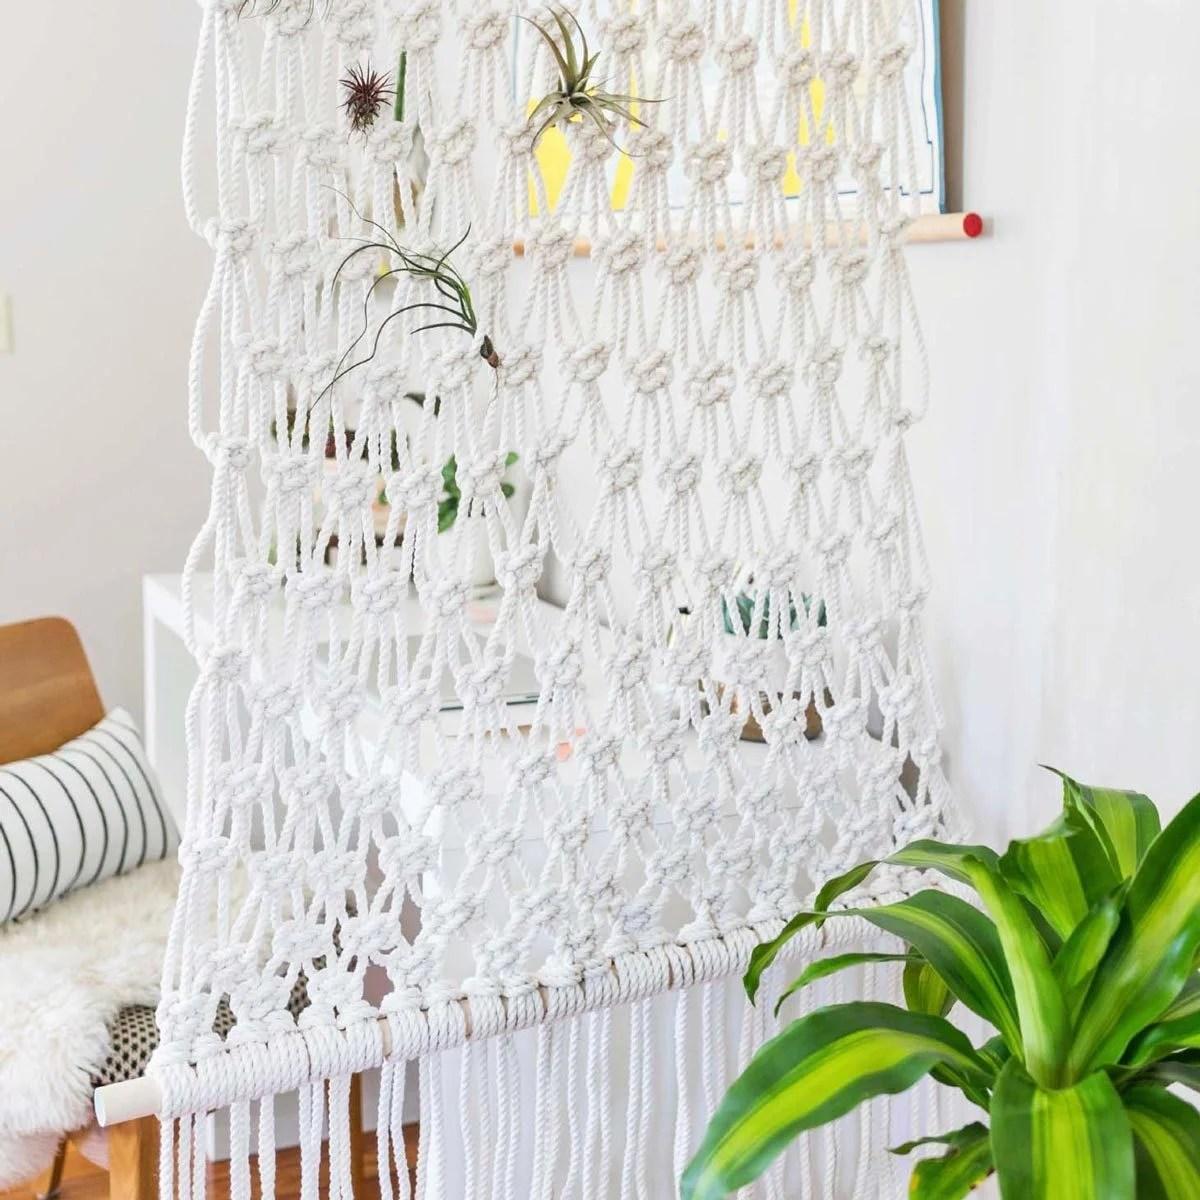 12 Incredible Diy Room Divider Ideas Family Handyman